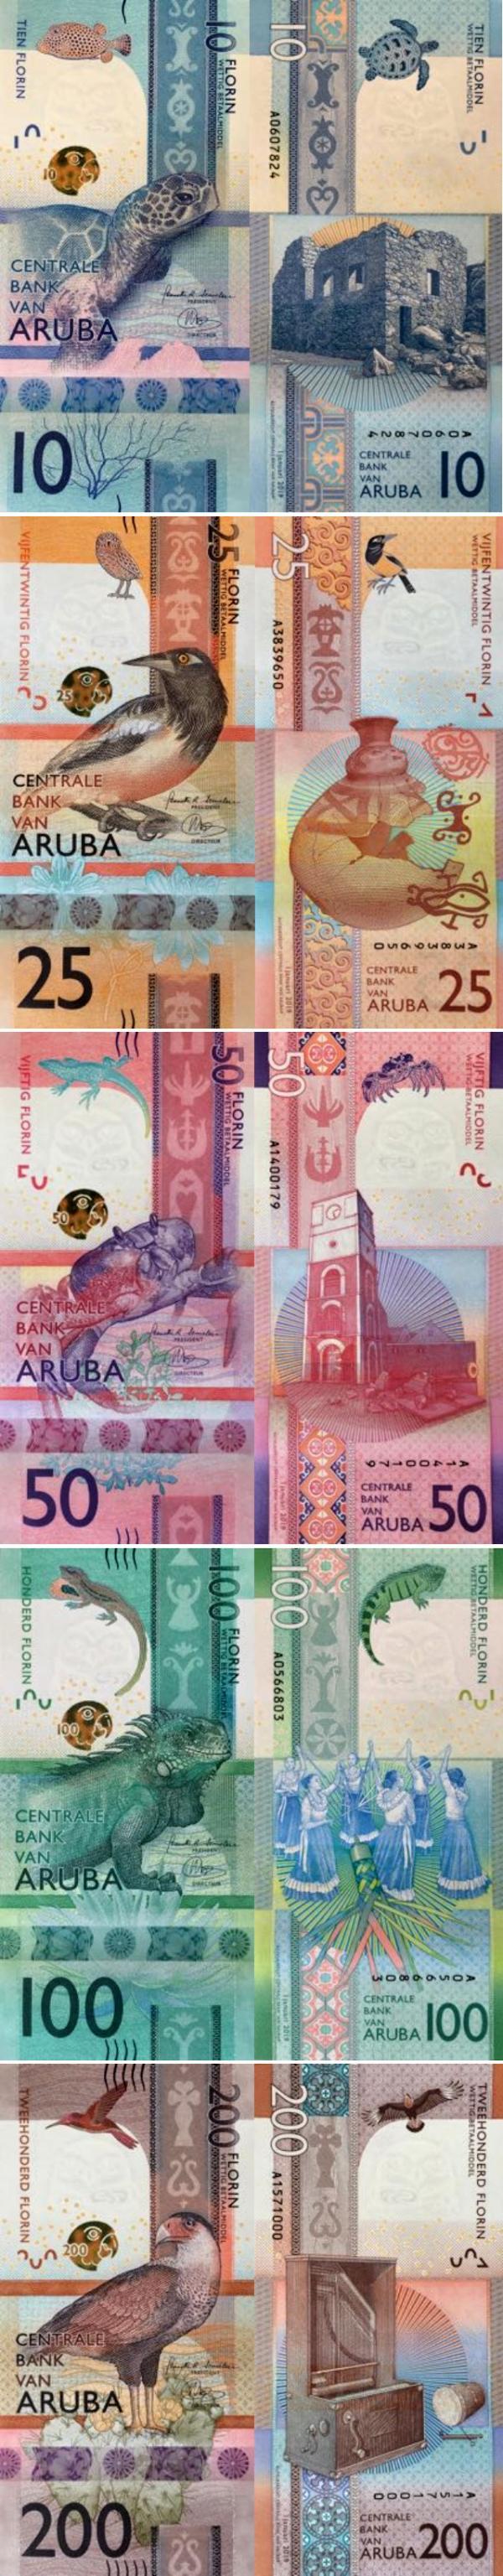 Aruba Banknote News